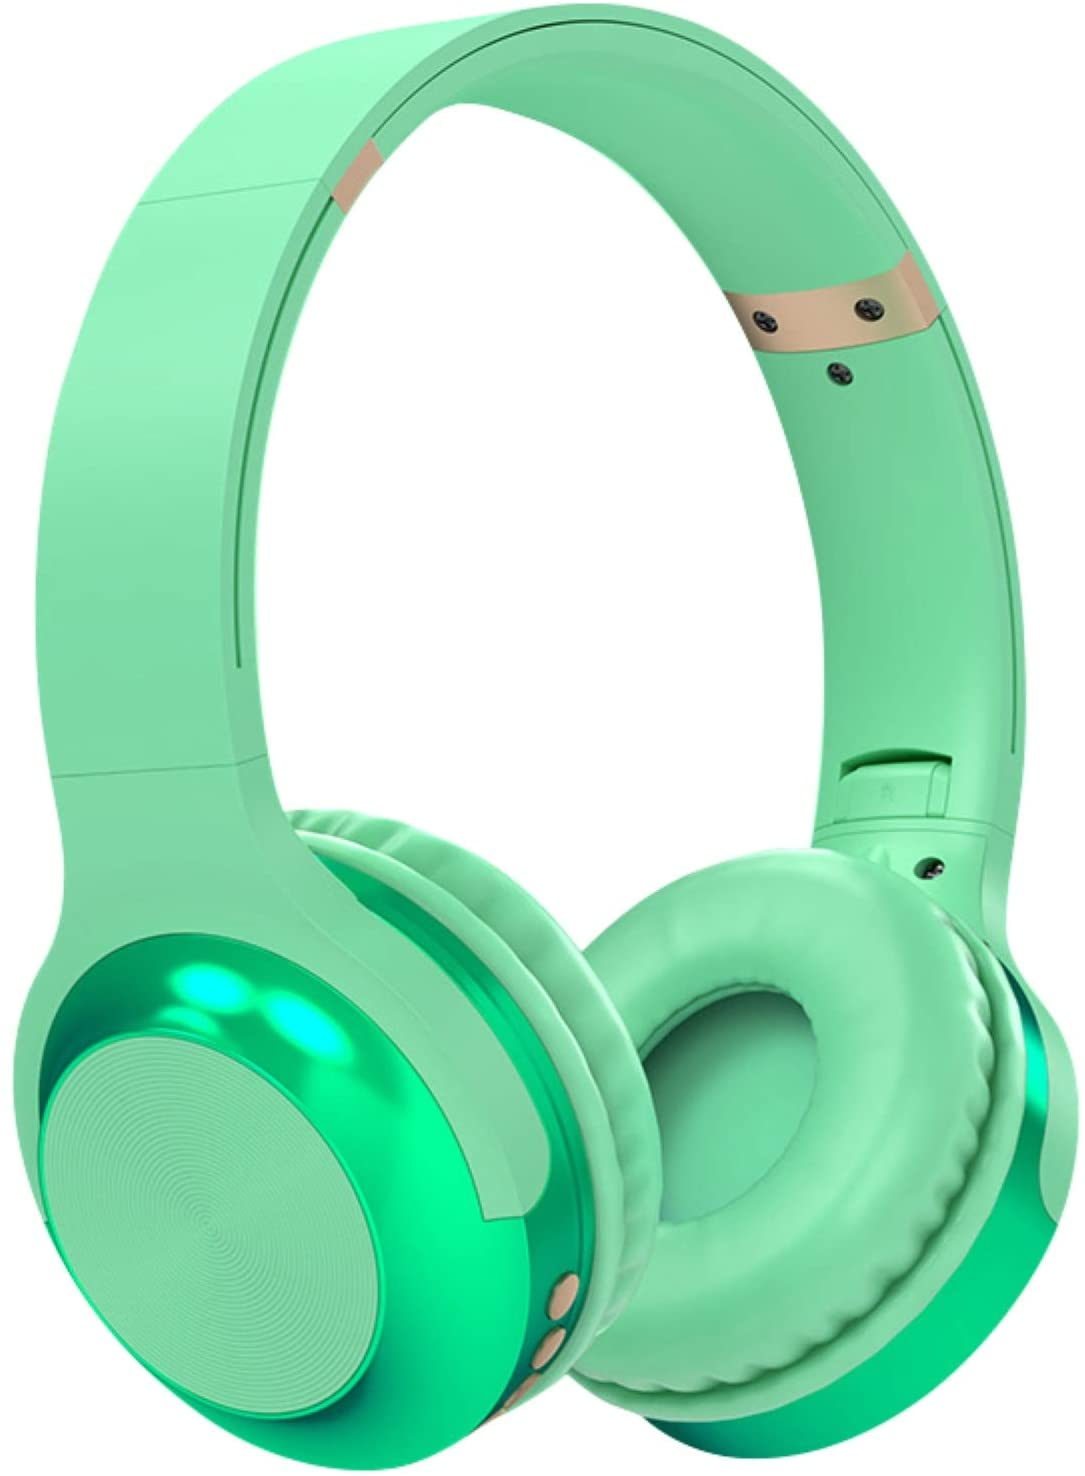 MOHALIKO Bluetooth Headphones, Wireless Headphones, A10 Head-Mounted Bluetooth Headset Stereo Wireless Card Radio Universal Earphone for School Home or Travel Green